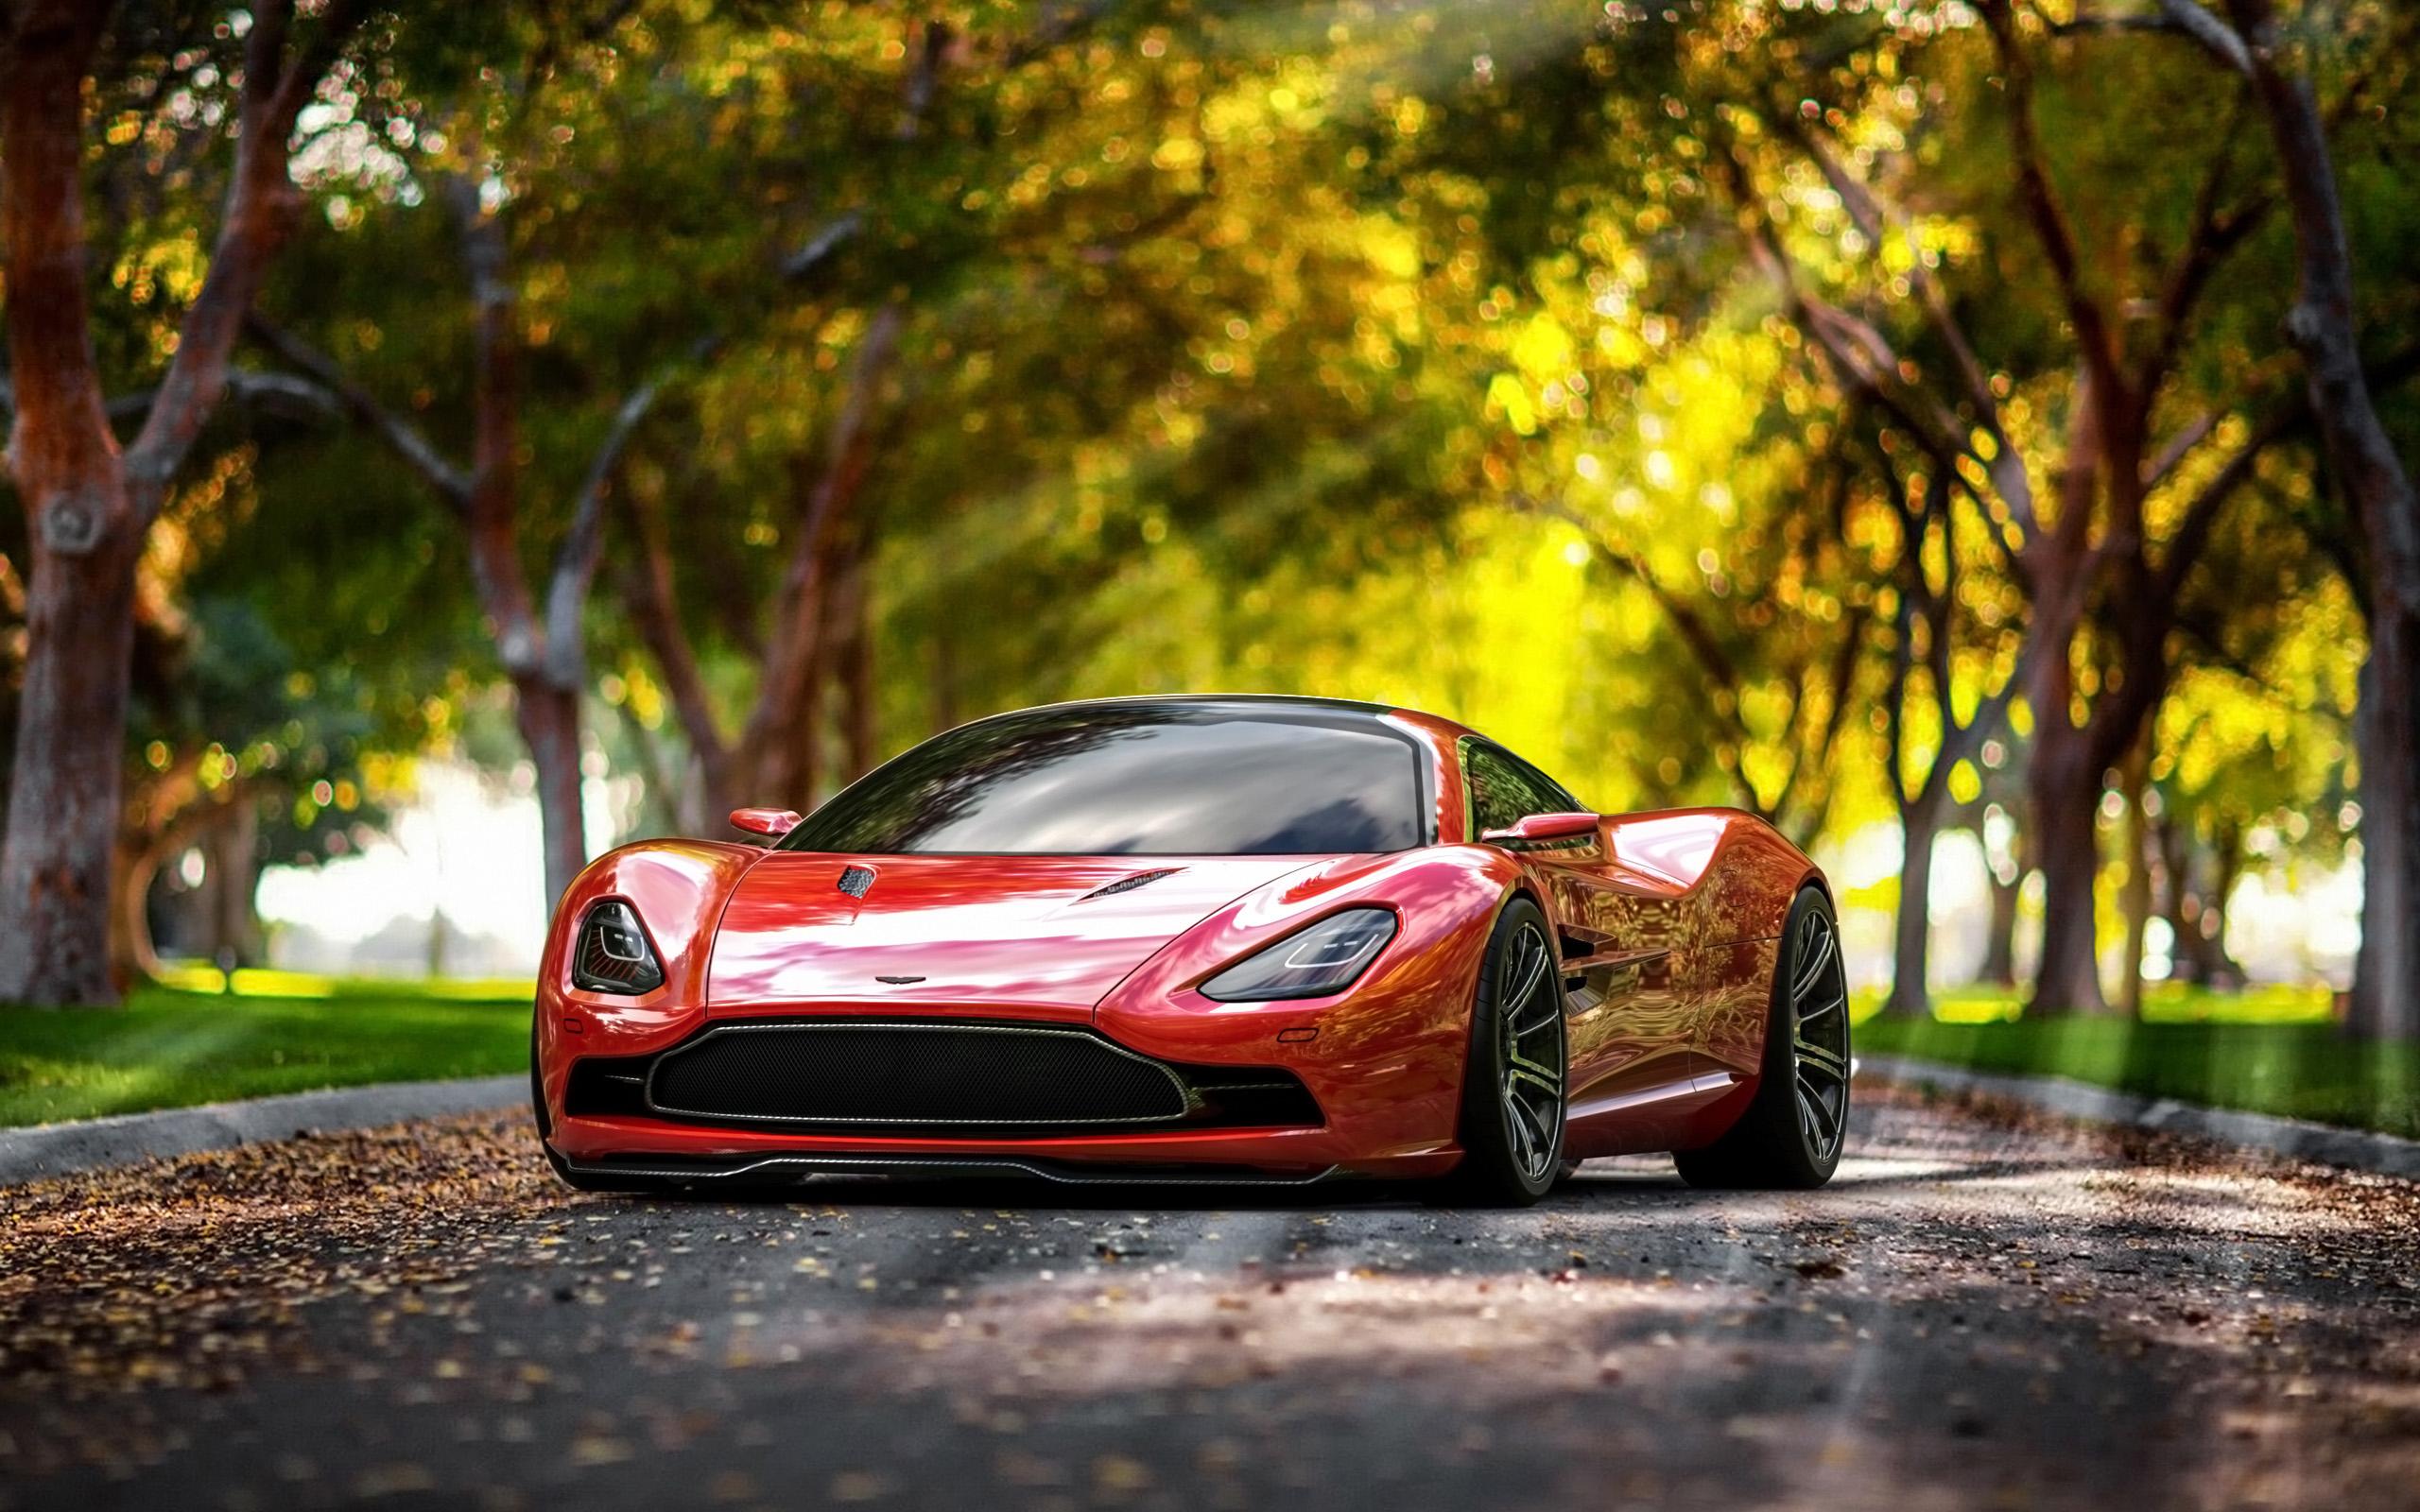 2013 Aston Martin DBC Concept 4 Nice Ideas